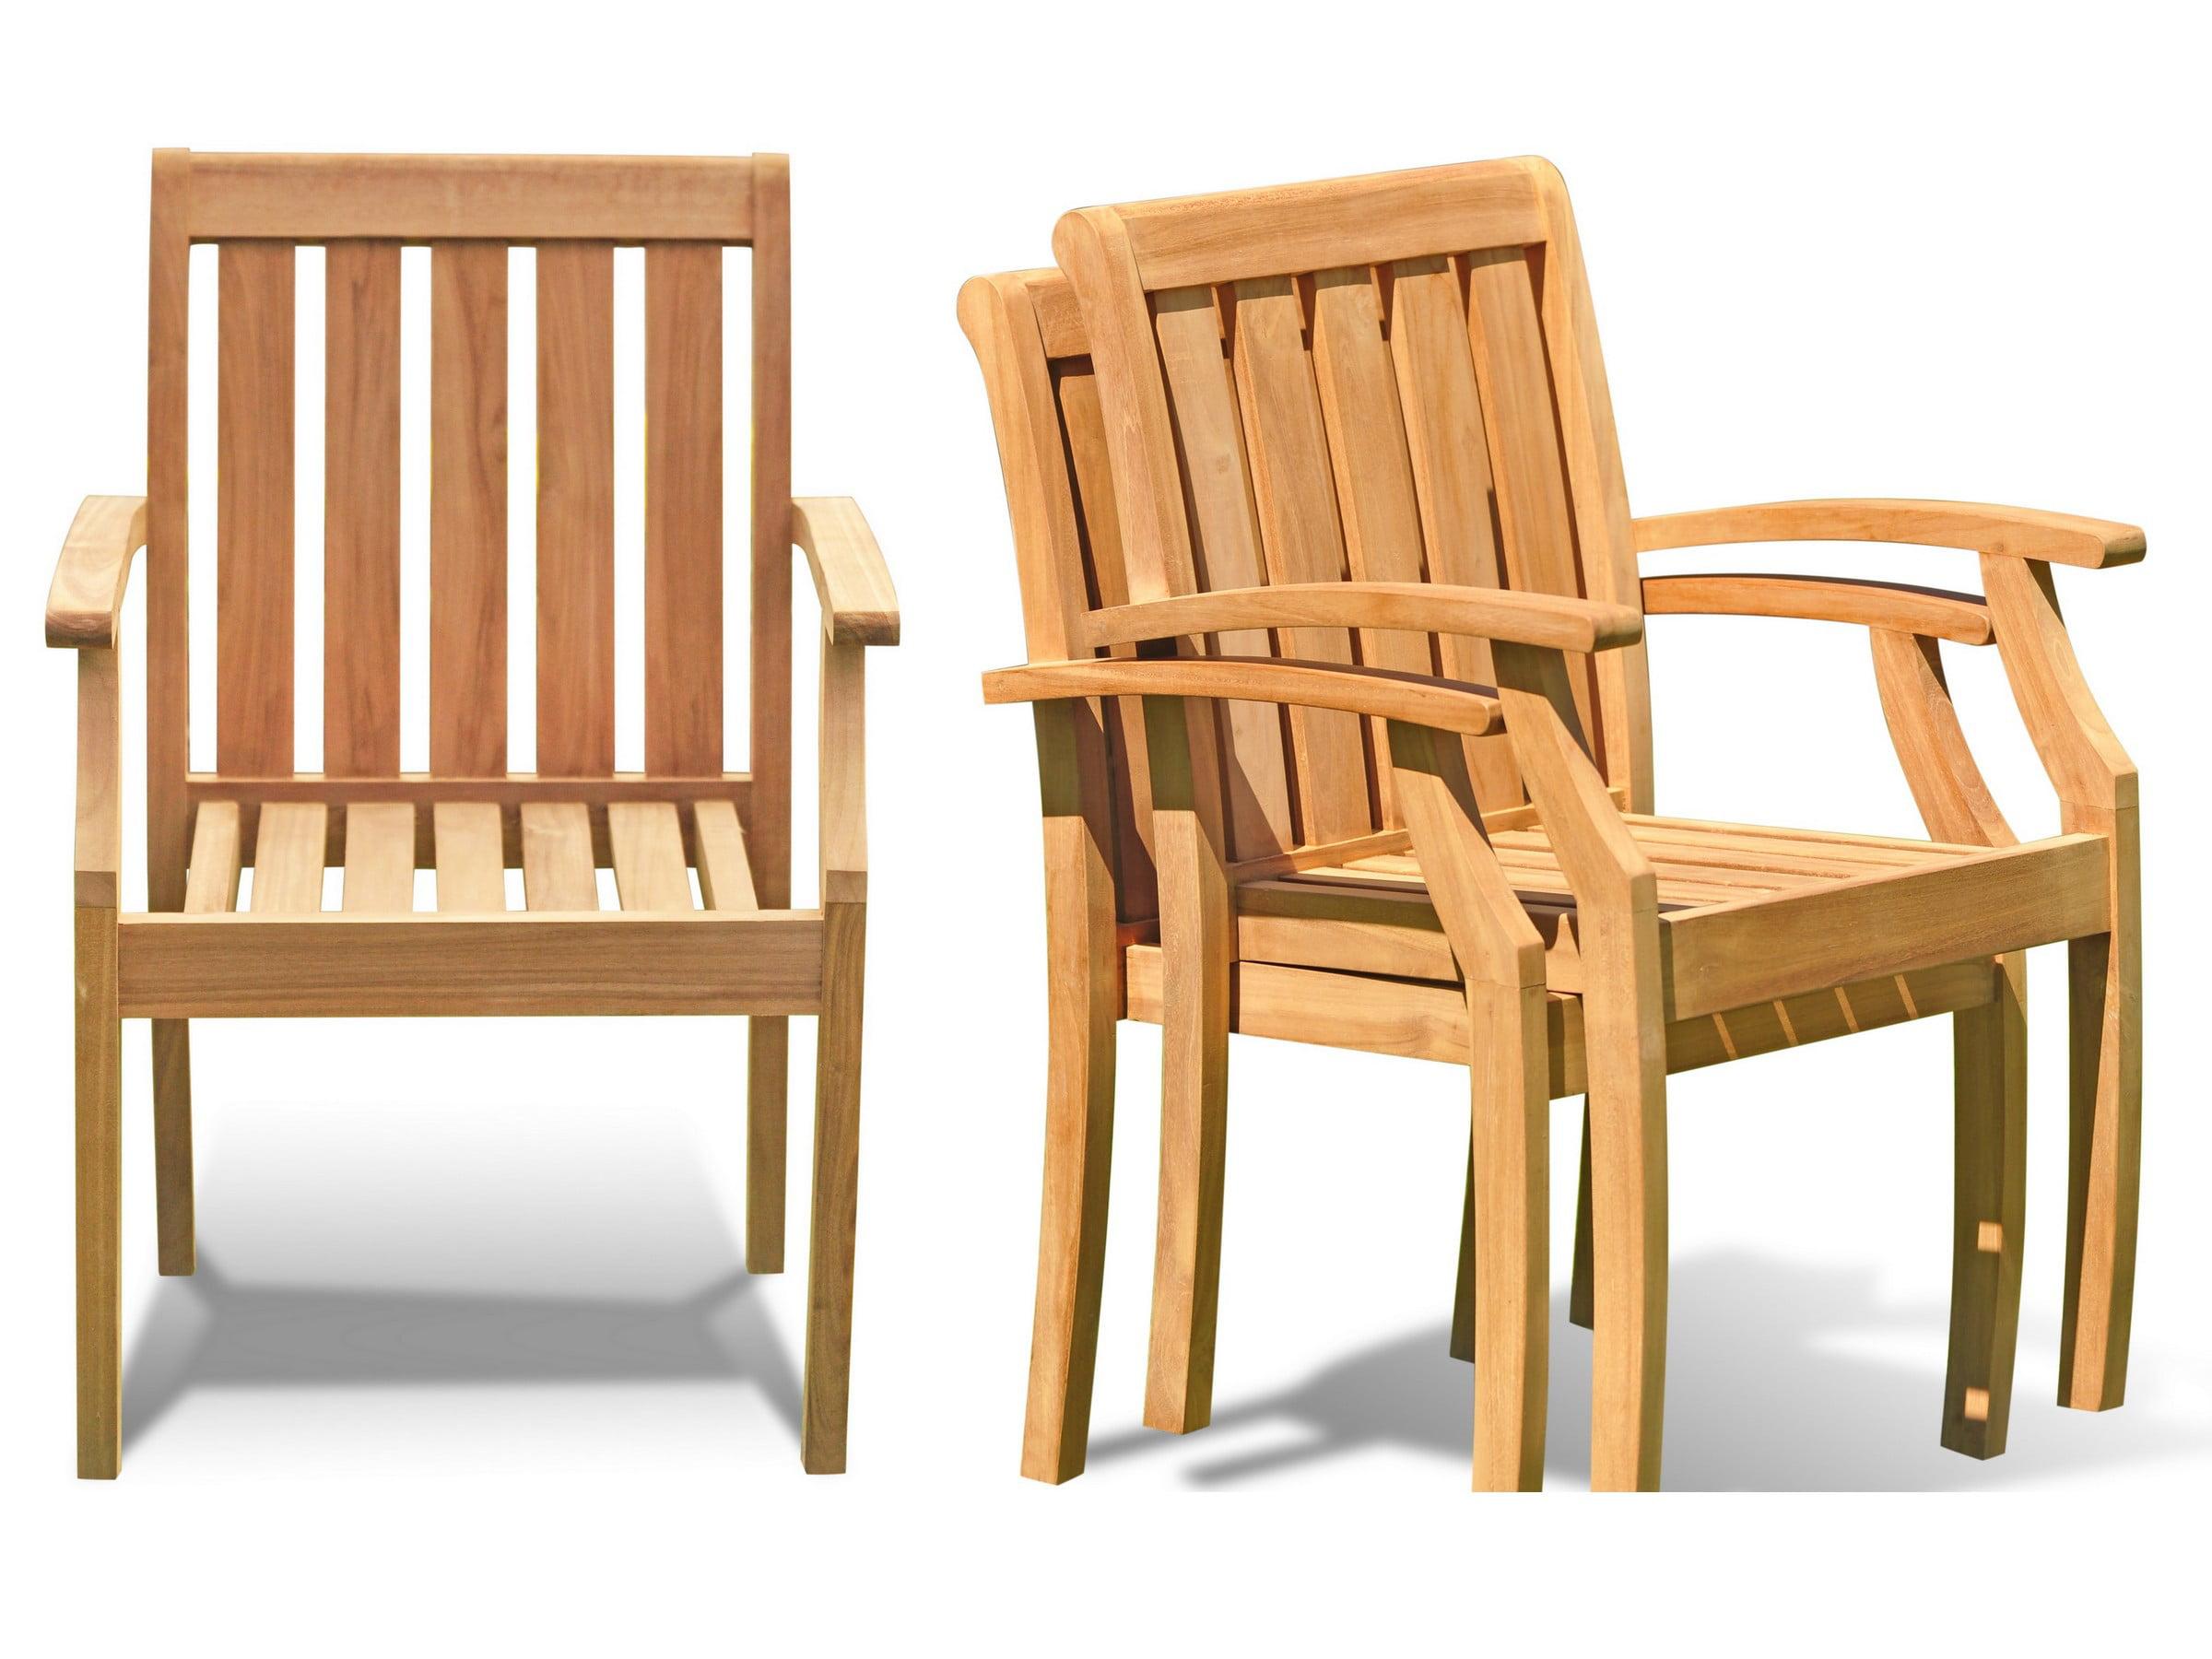 Somerset Stacking Arm Captain Grade-A Teak Wood Luxurious Solo Single Dining Chair WholesaleTeak #WMDCARSSPR by WholesaleTeak